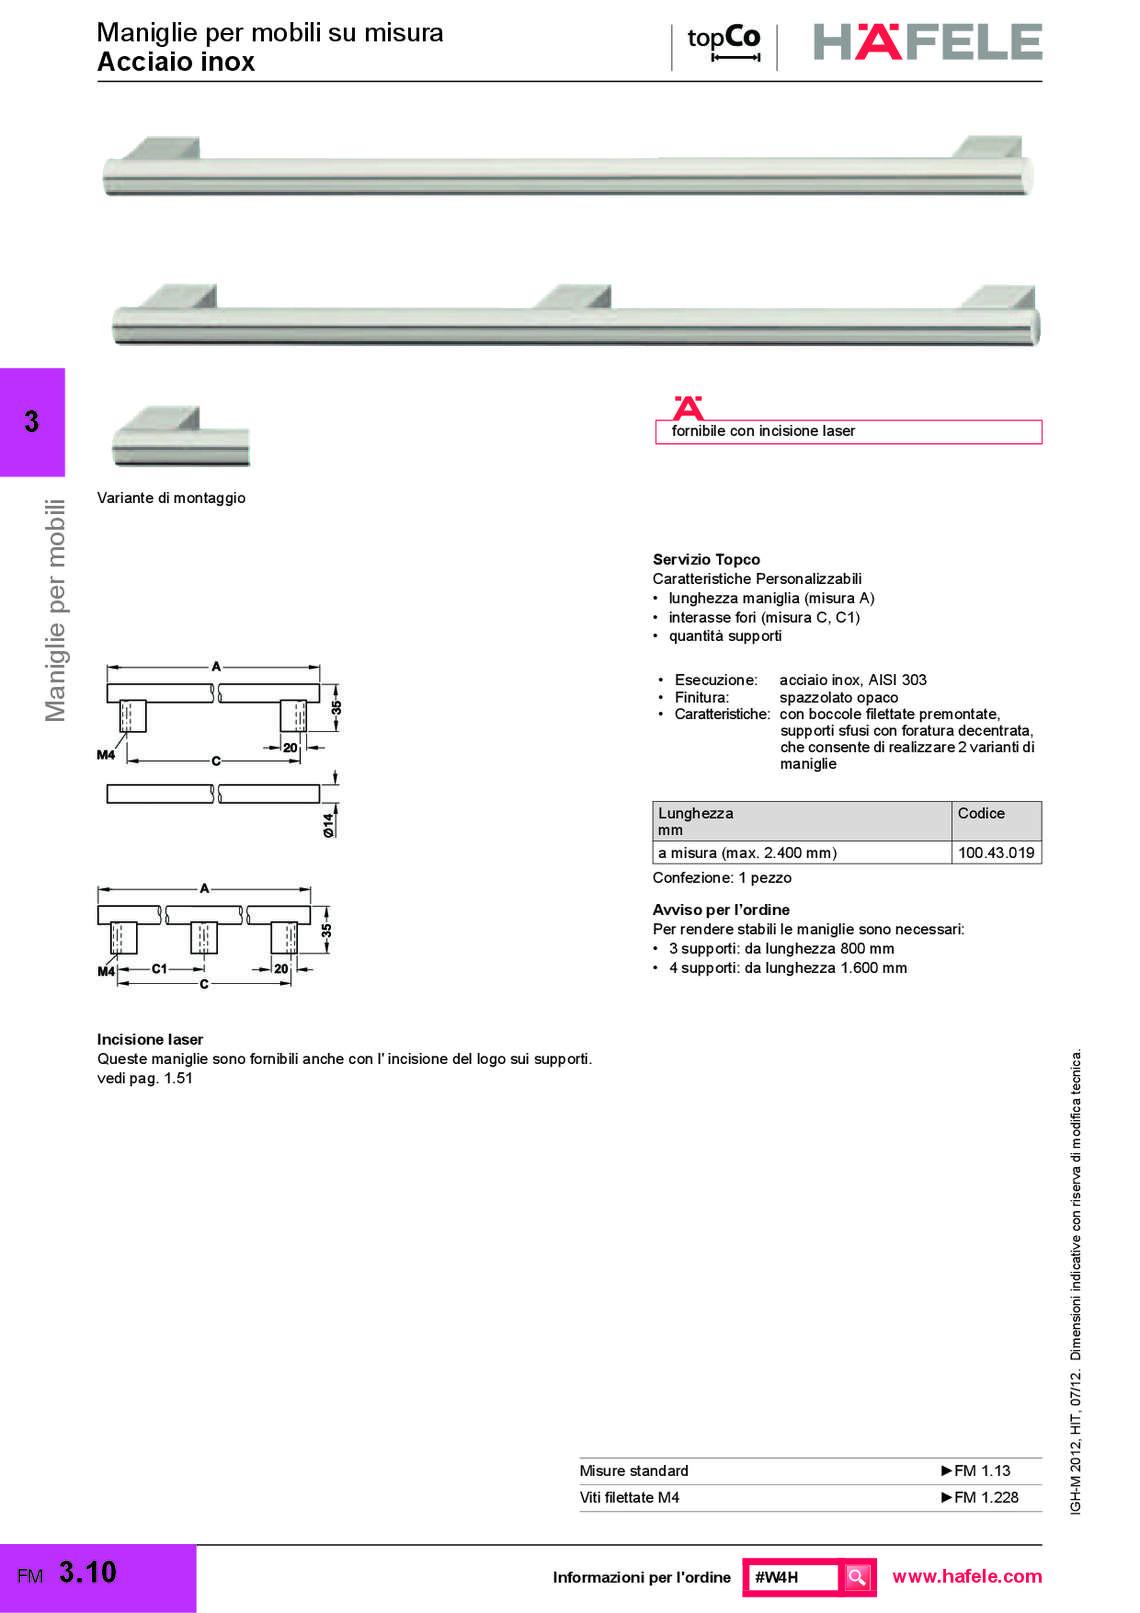 hafele-prodotti-su-misura_81_019.jpg